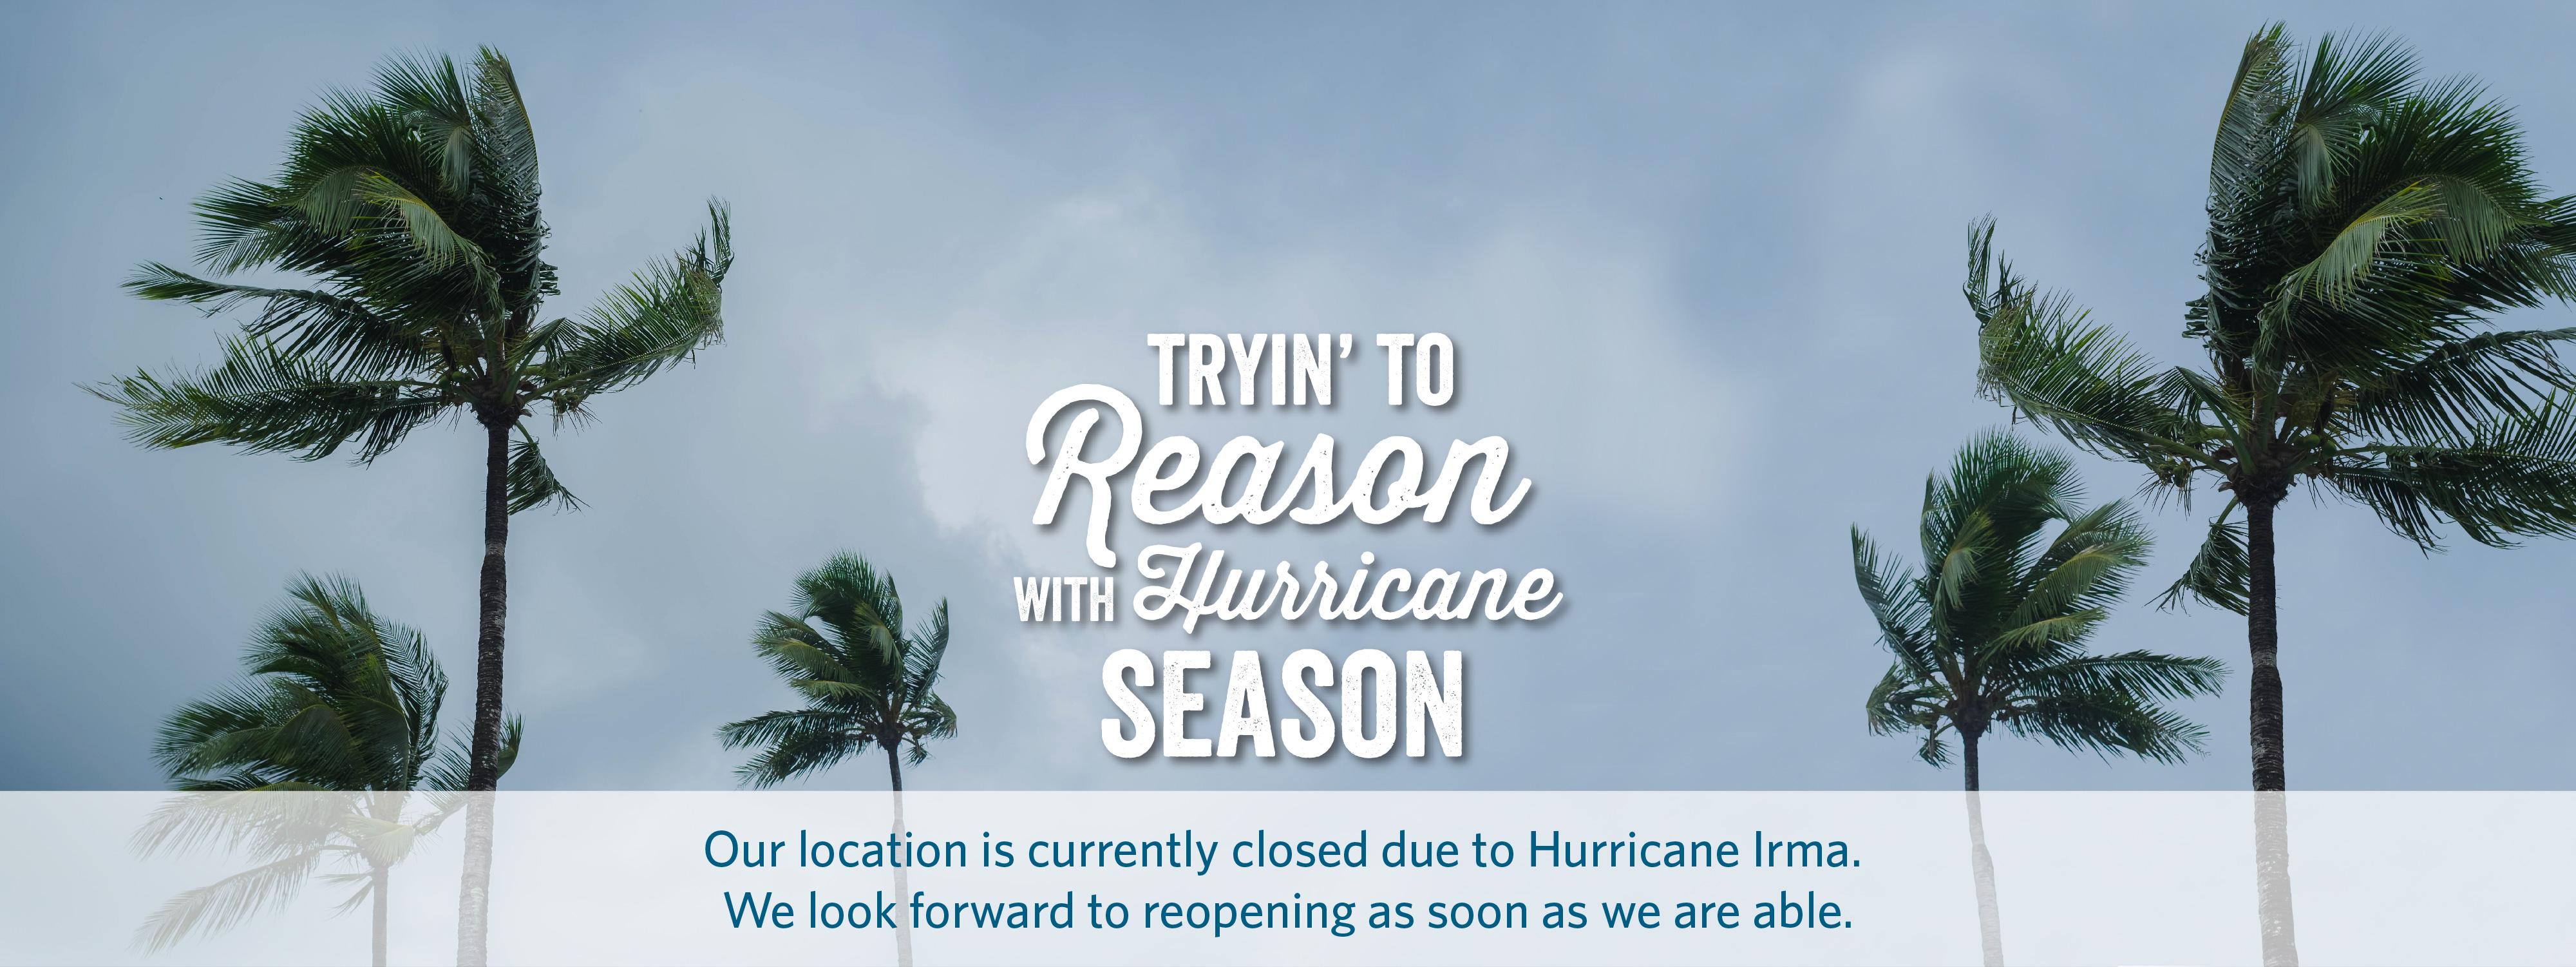 170918_HurricaneSeason_OurLocationClosed_02_4__1_.jpg